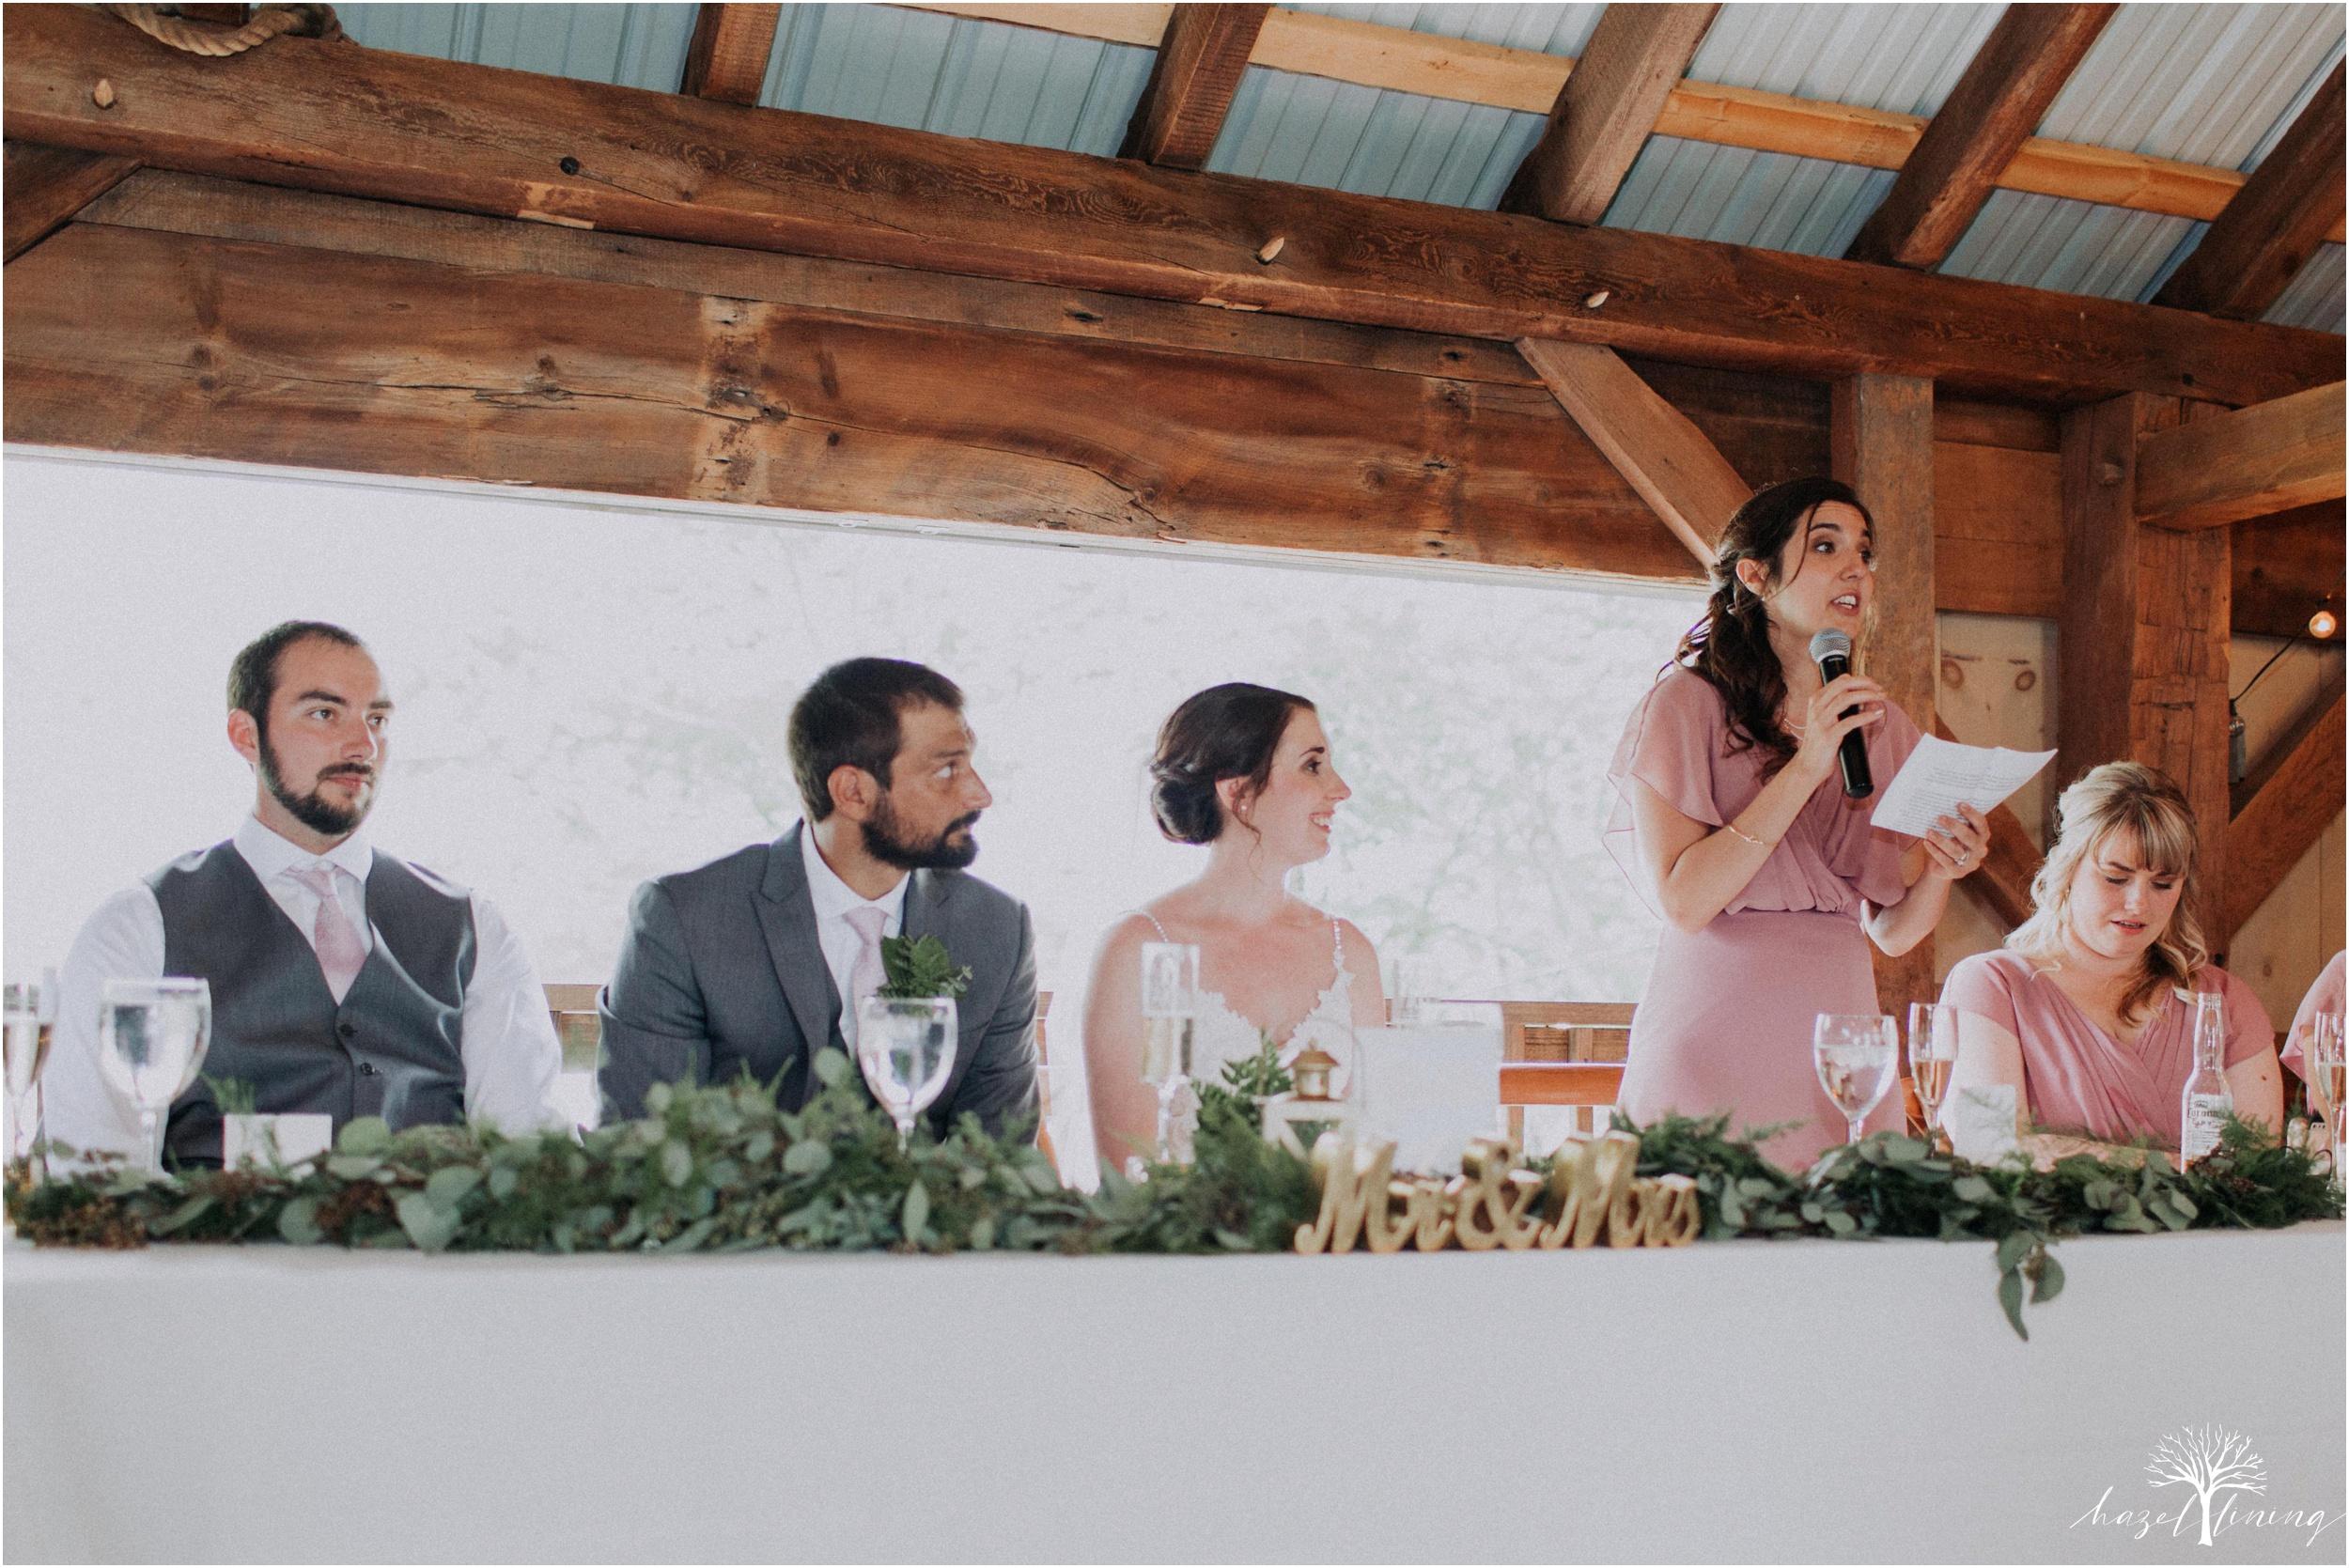 hazel-lining-travel-wedding-elopement-photography-lisa-landon-shoemaker-the-farm-bakery-and-events-bucks-county-quakertown-pennsylvania-summer-country-outdoor-farm-wedding_0121.jpg